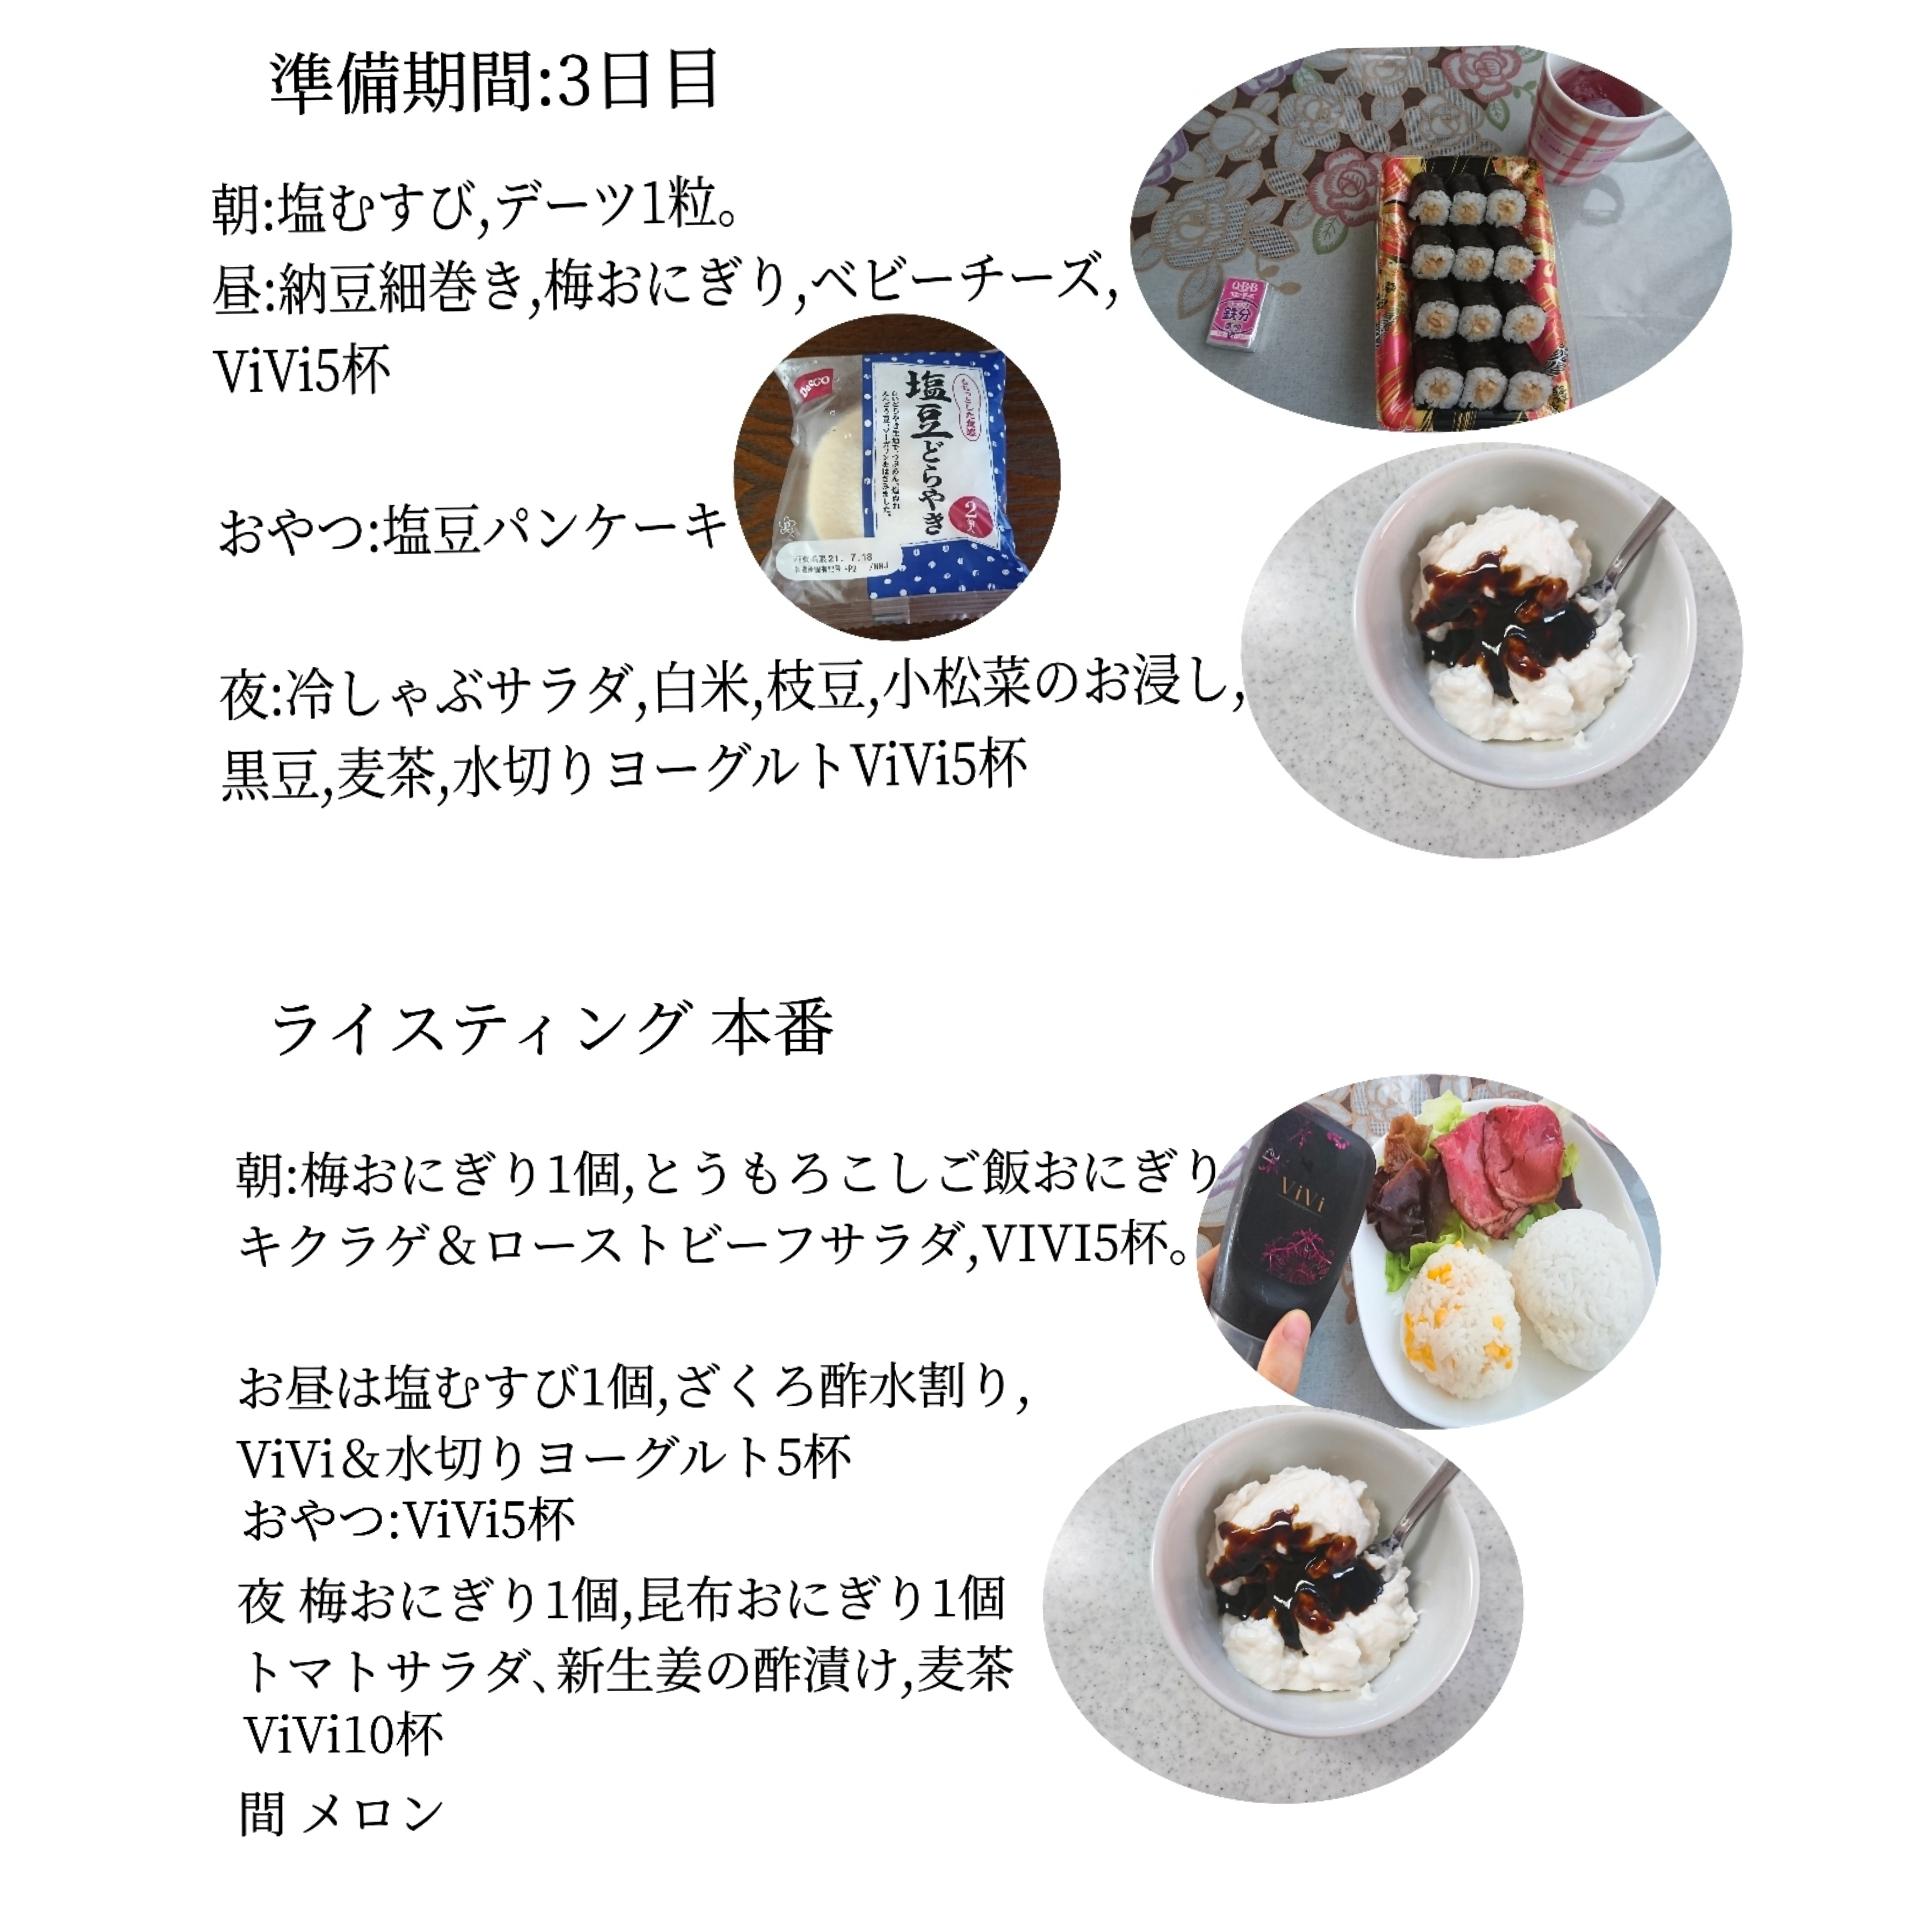 Salon de NOEL(サロン・ド ノエル)植物発酵エキス ViViを使ったYuKaRi♡さんのクチコミ画像6